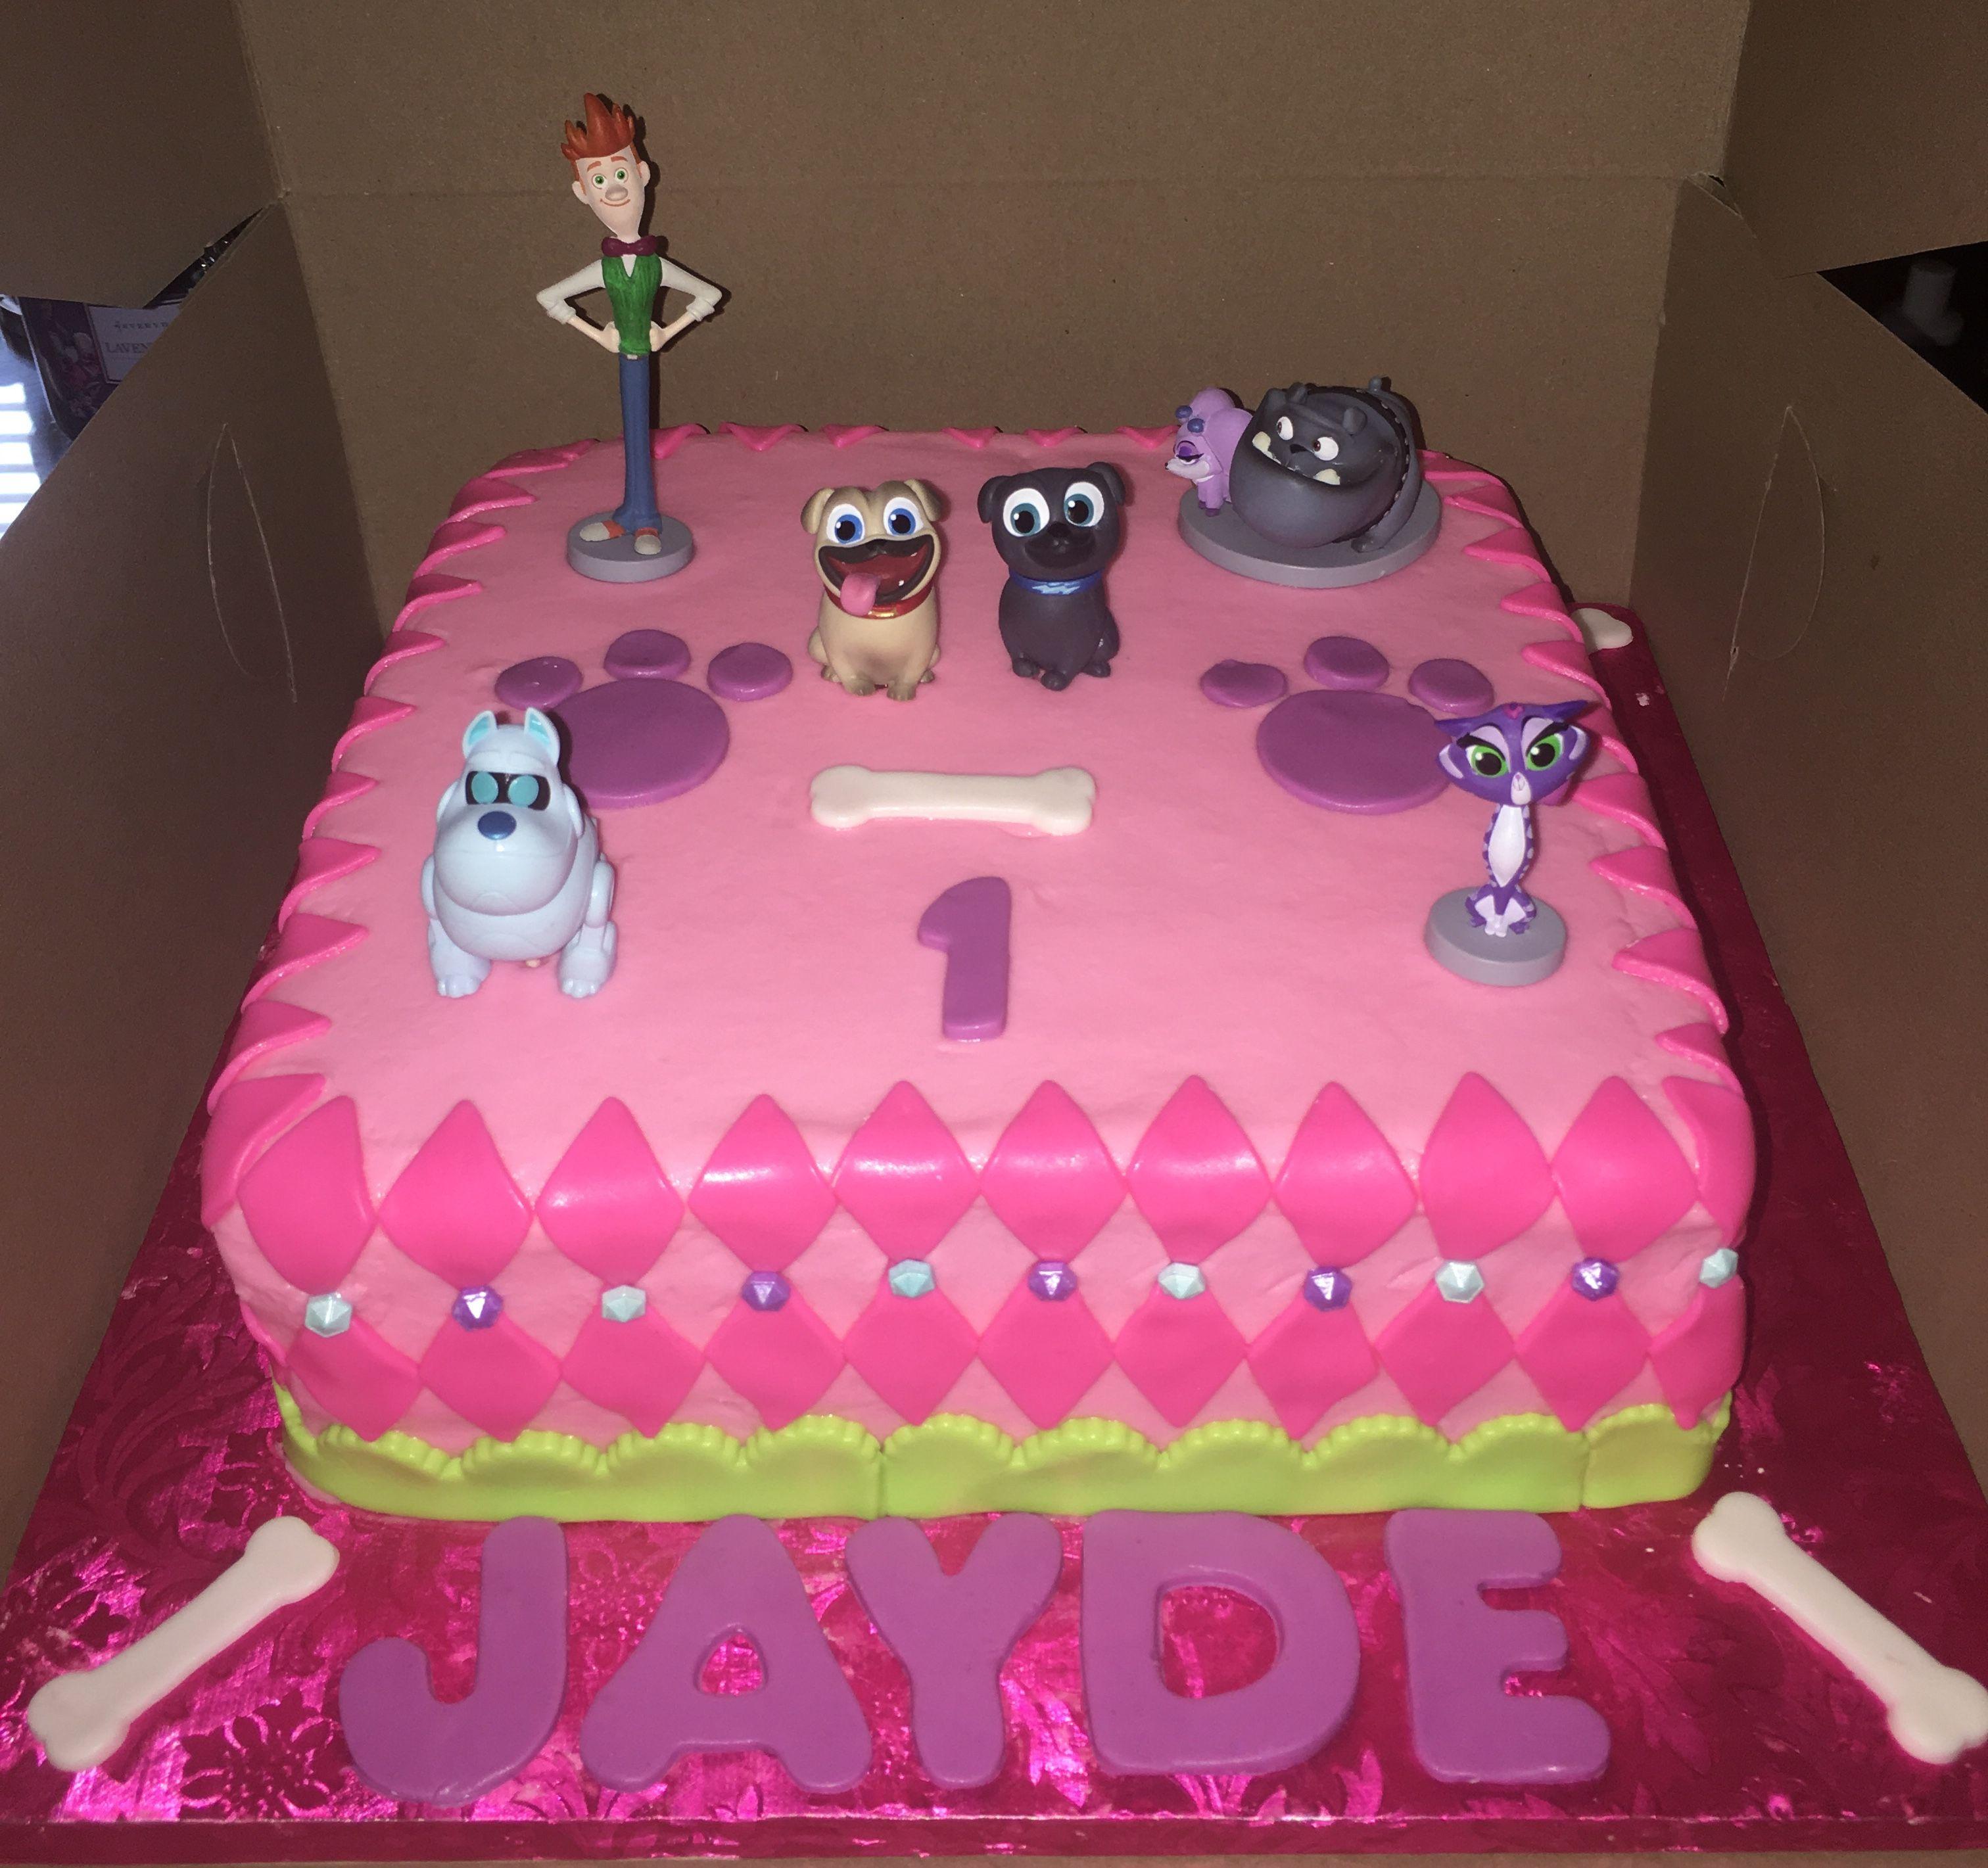 Puppy Dog Pals Cake Birthday Cake Girls Paw Birthday 3rd